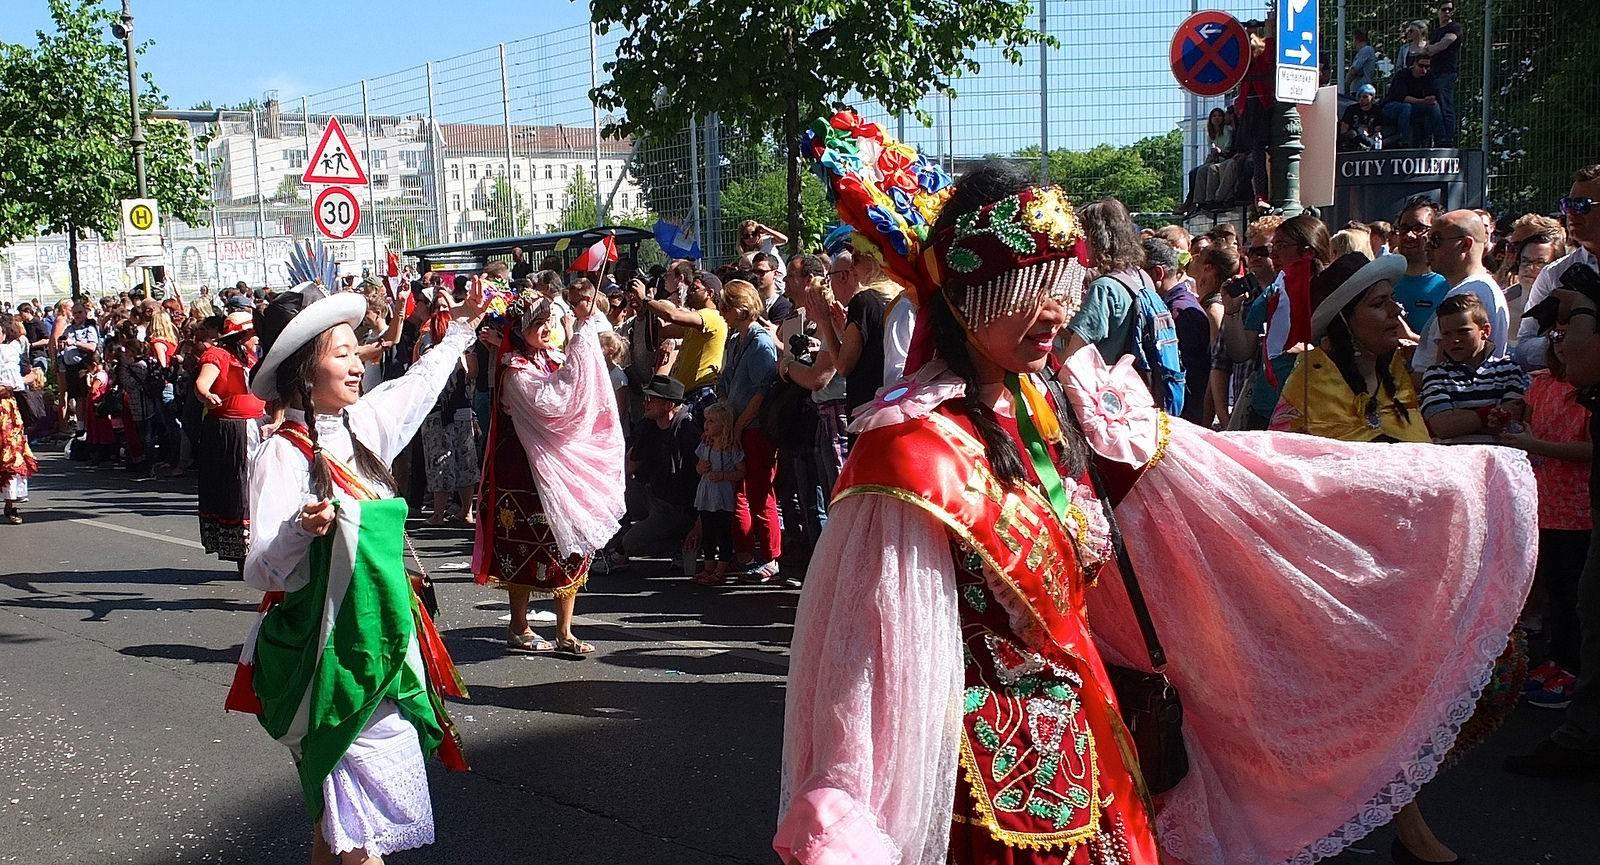 karnevalderkulturen4 KdK   Karneval der Kulturen in Berlin (Carnival of Cultures)